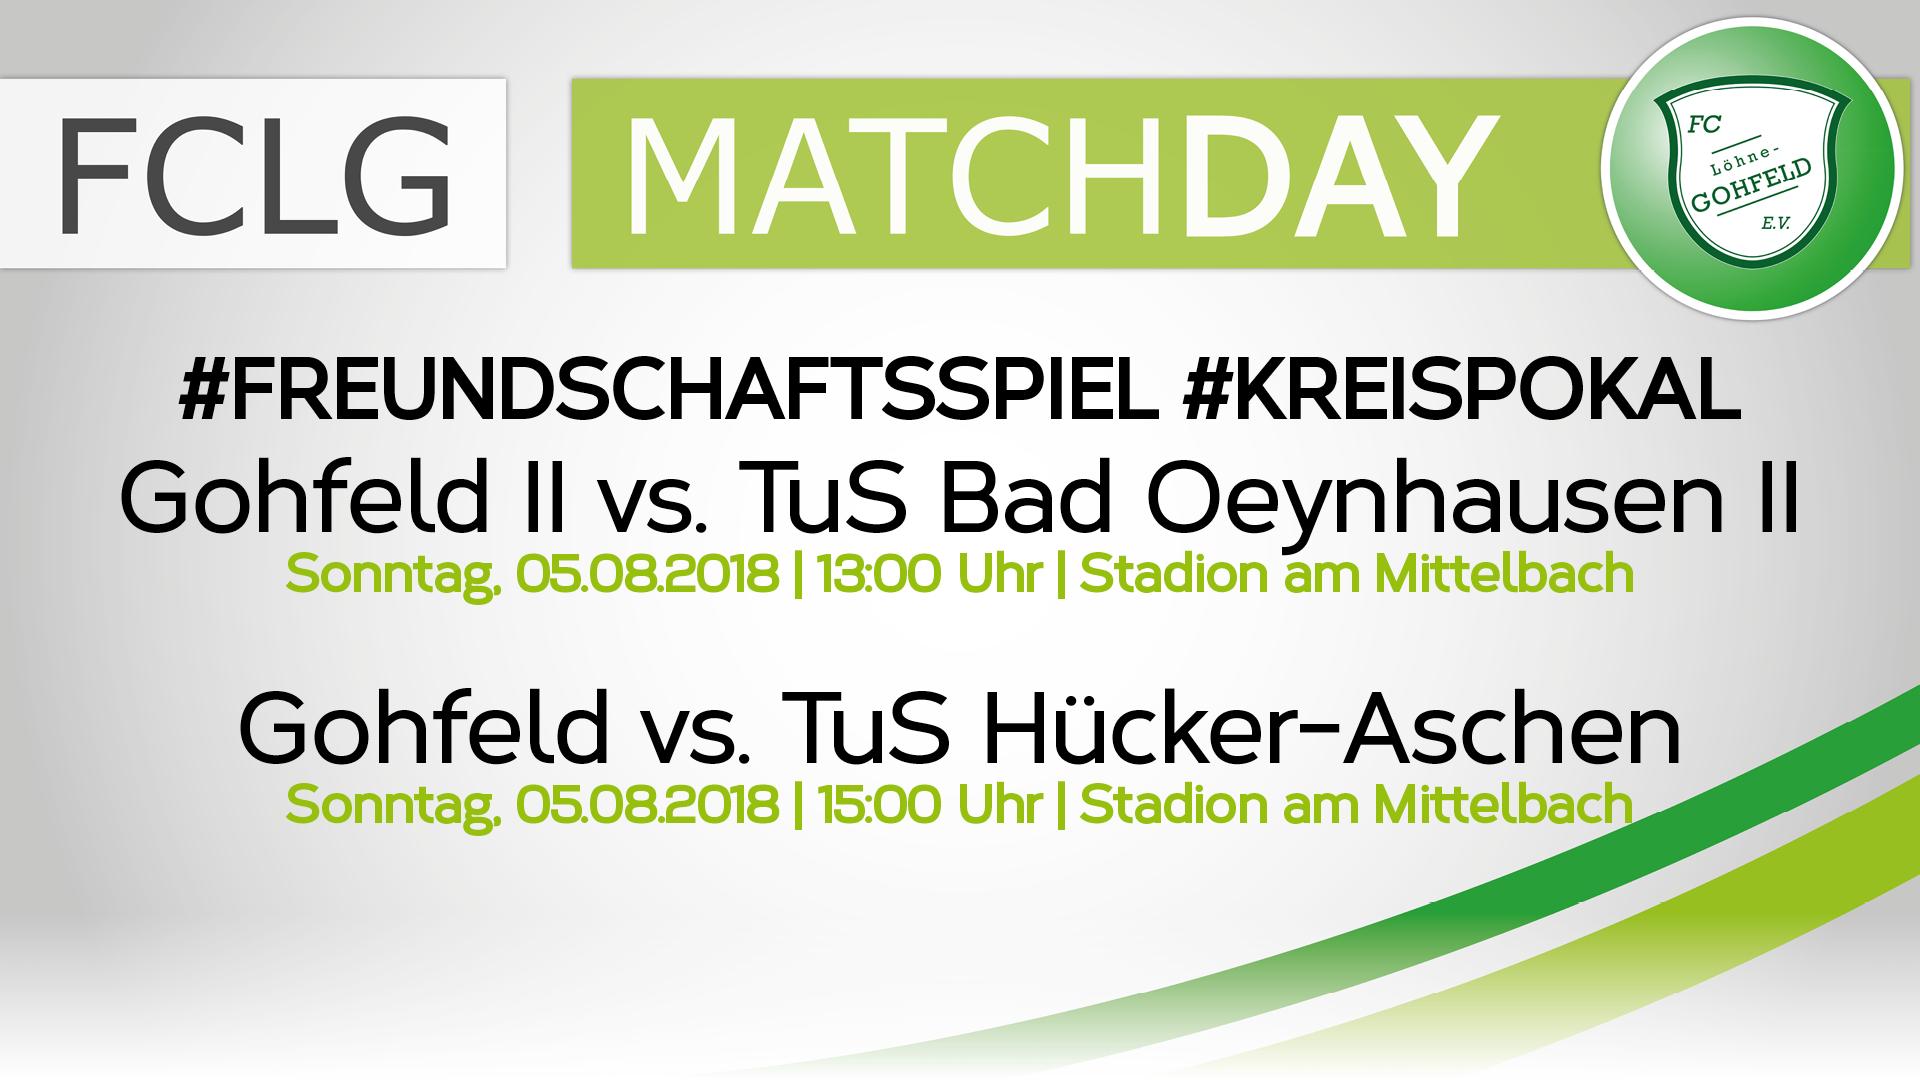 Gohfeld vs. TuS Hücker-Aschen